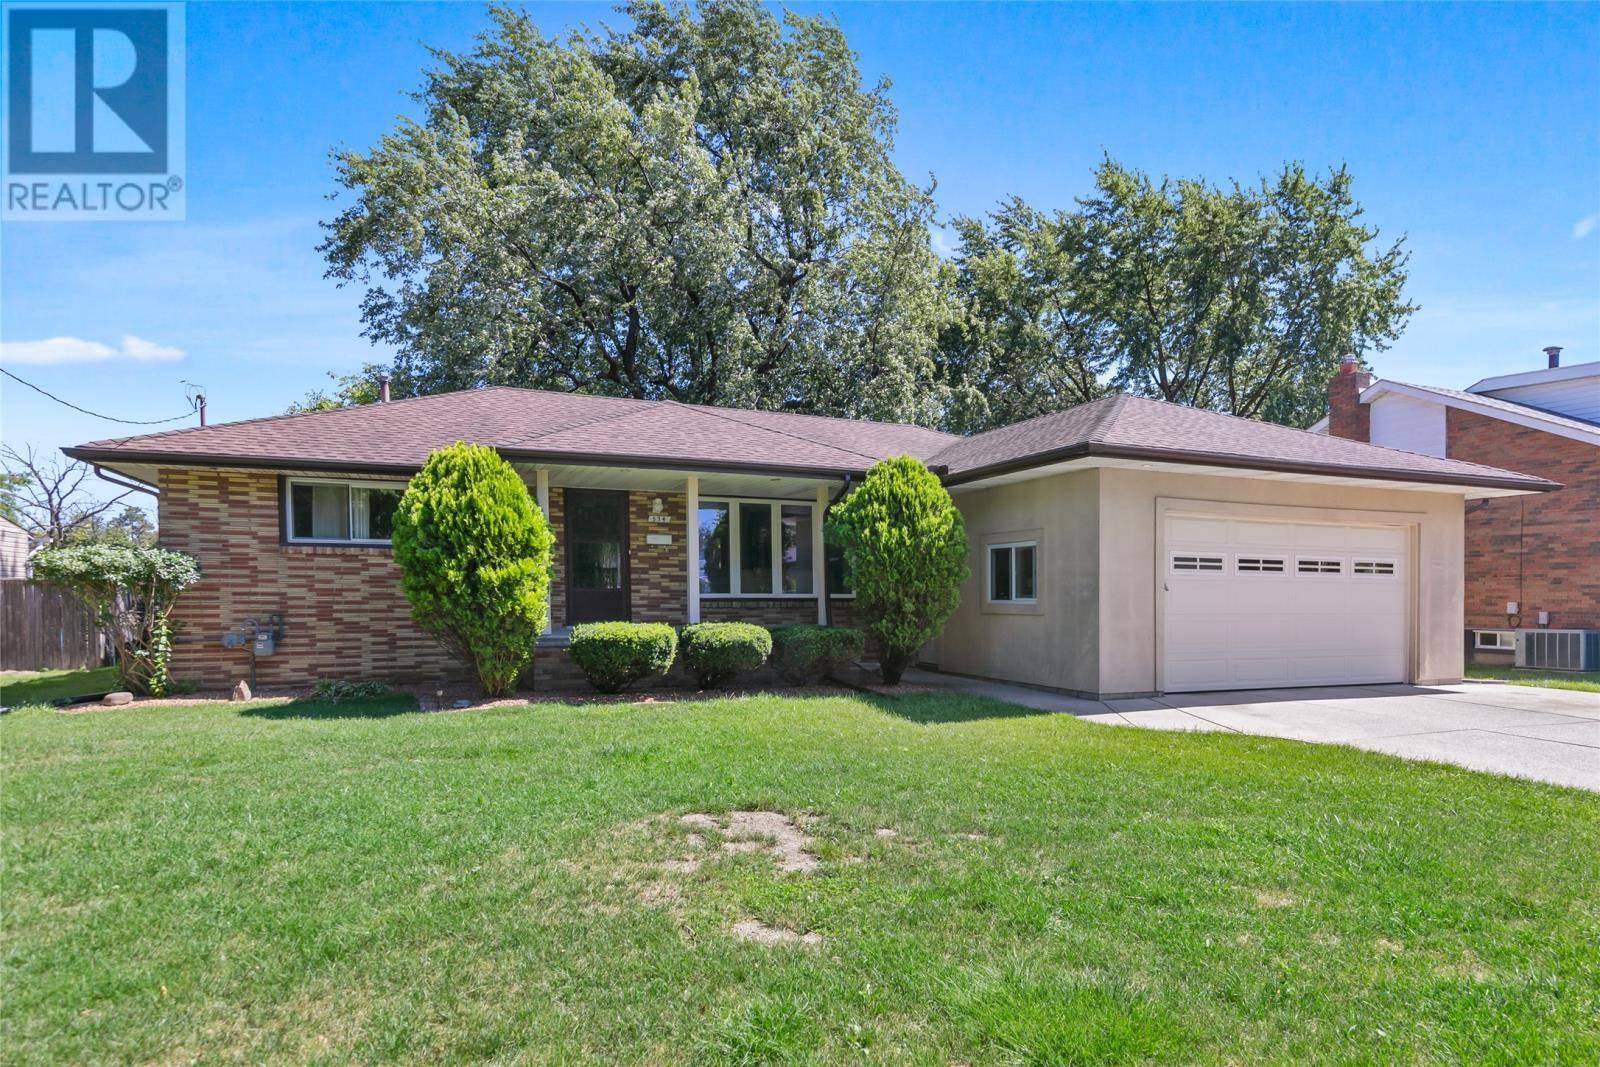 House for sale at 574 Brighton Rd St. Clair Beach Ontario - MLS: 19028422